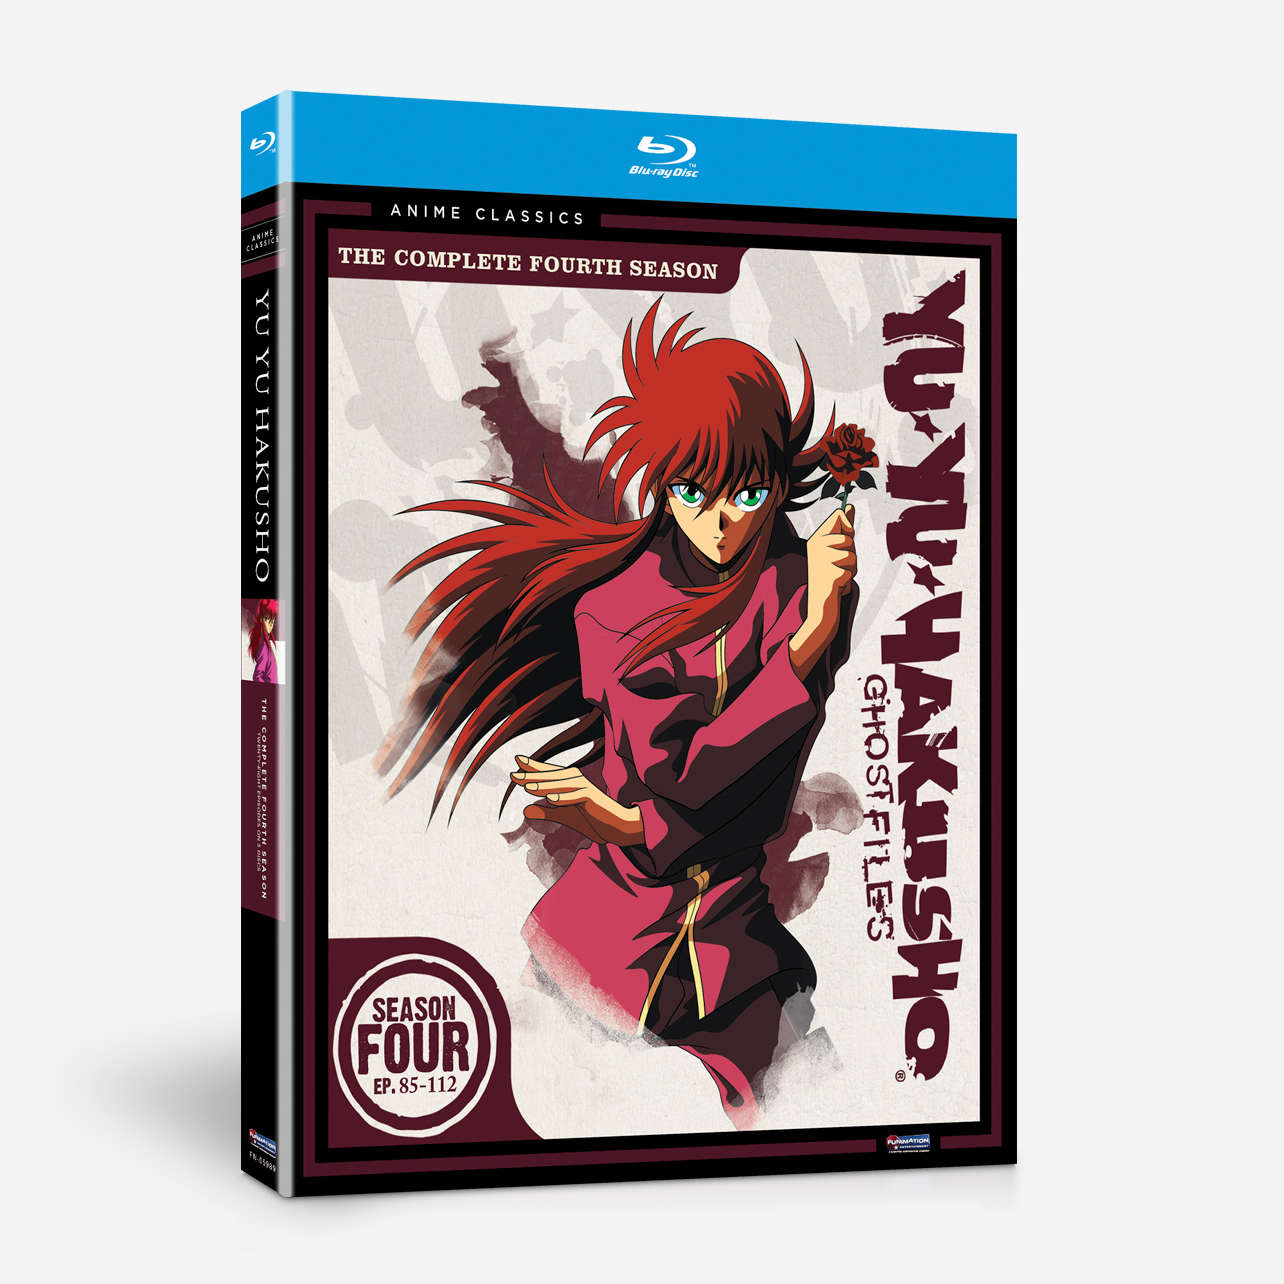 Season Four - Anime Classics home-video